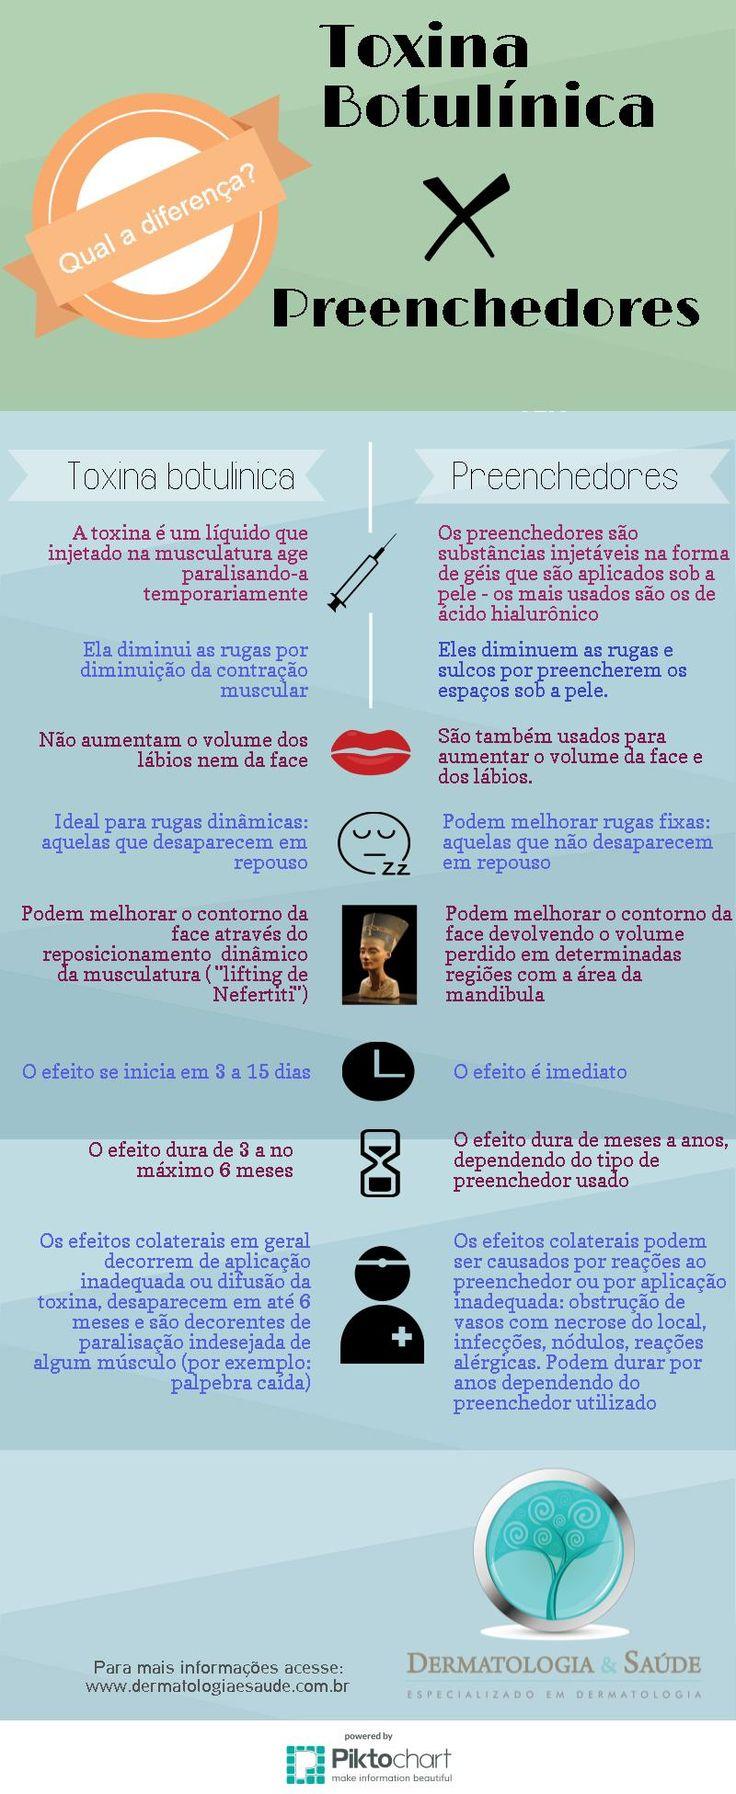 Botox versus Preenchedores: tudo o que você precisa saber! #botox #toxinabotulínica #preenchedores #ácidohialurônico #dermatologia #dermatologiaesaude